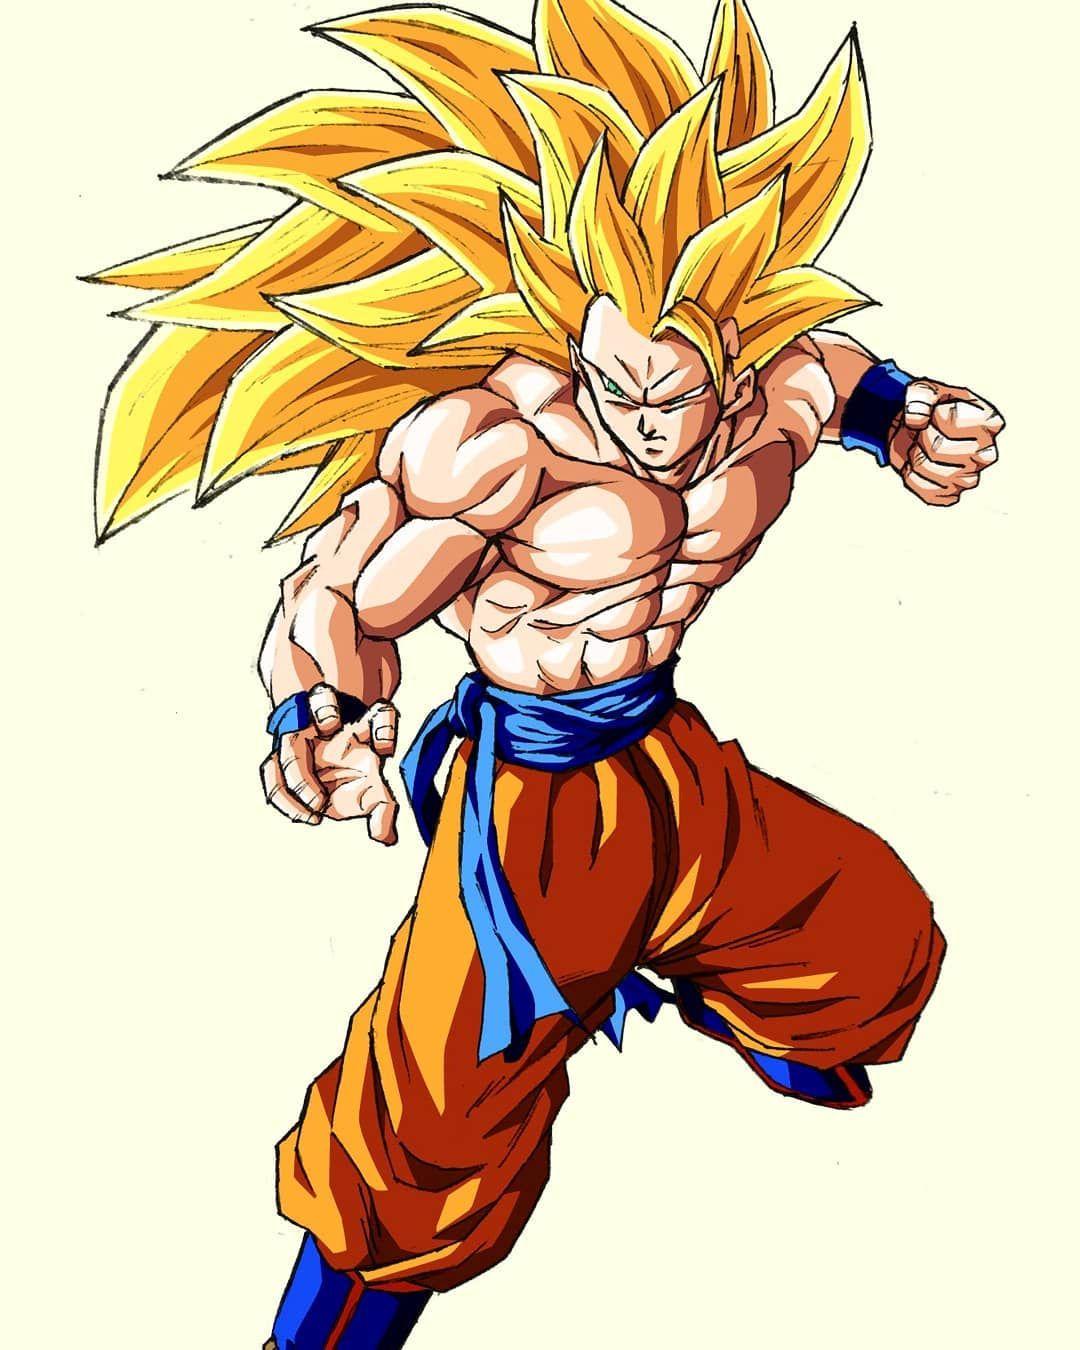 Goku Ssj3 Dbz Dbs Dragonball Fairytale Ssj Tokiogoul Gohan Naruto Piccolo Attackontitan Dragon Ball Z Dragon Ball Goku Dragon Ball Super Manga